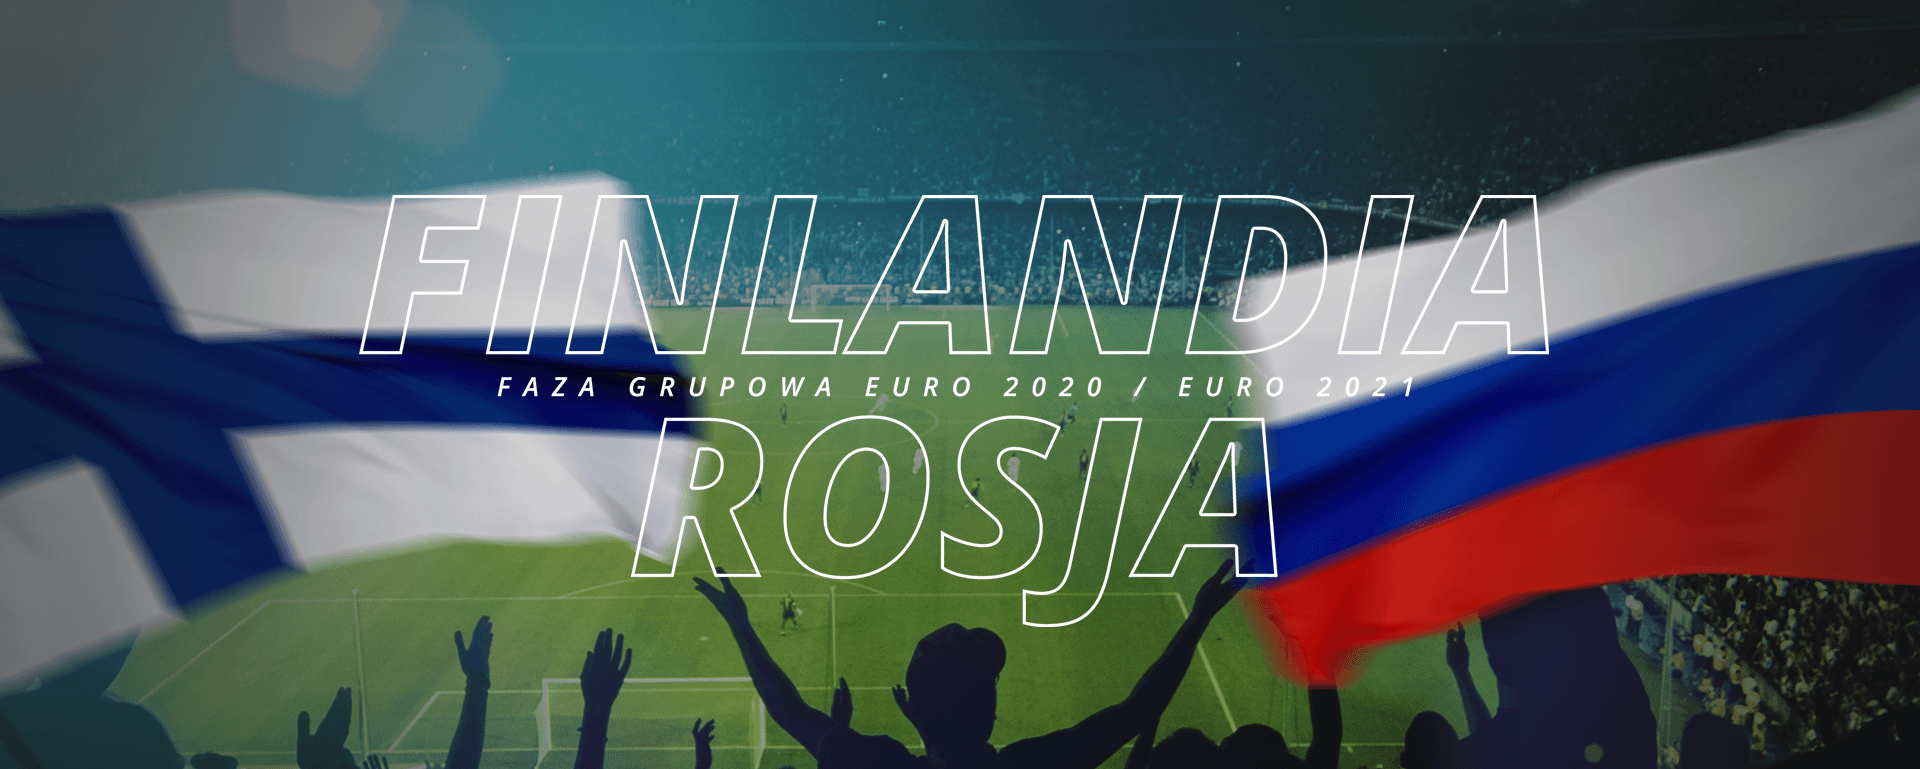 Finlandia – Rosja | faza grupowa Euro 2020 / Euro 2021